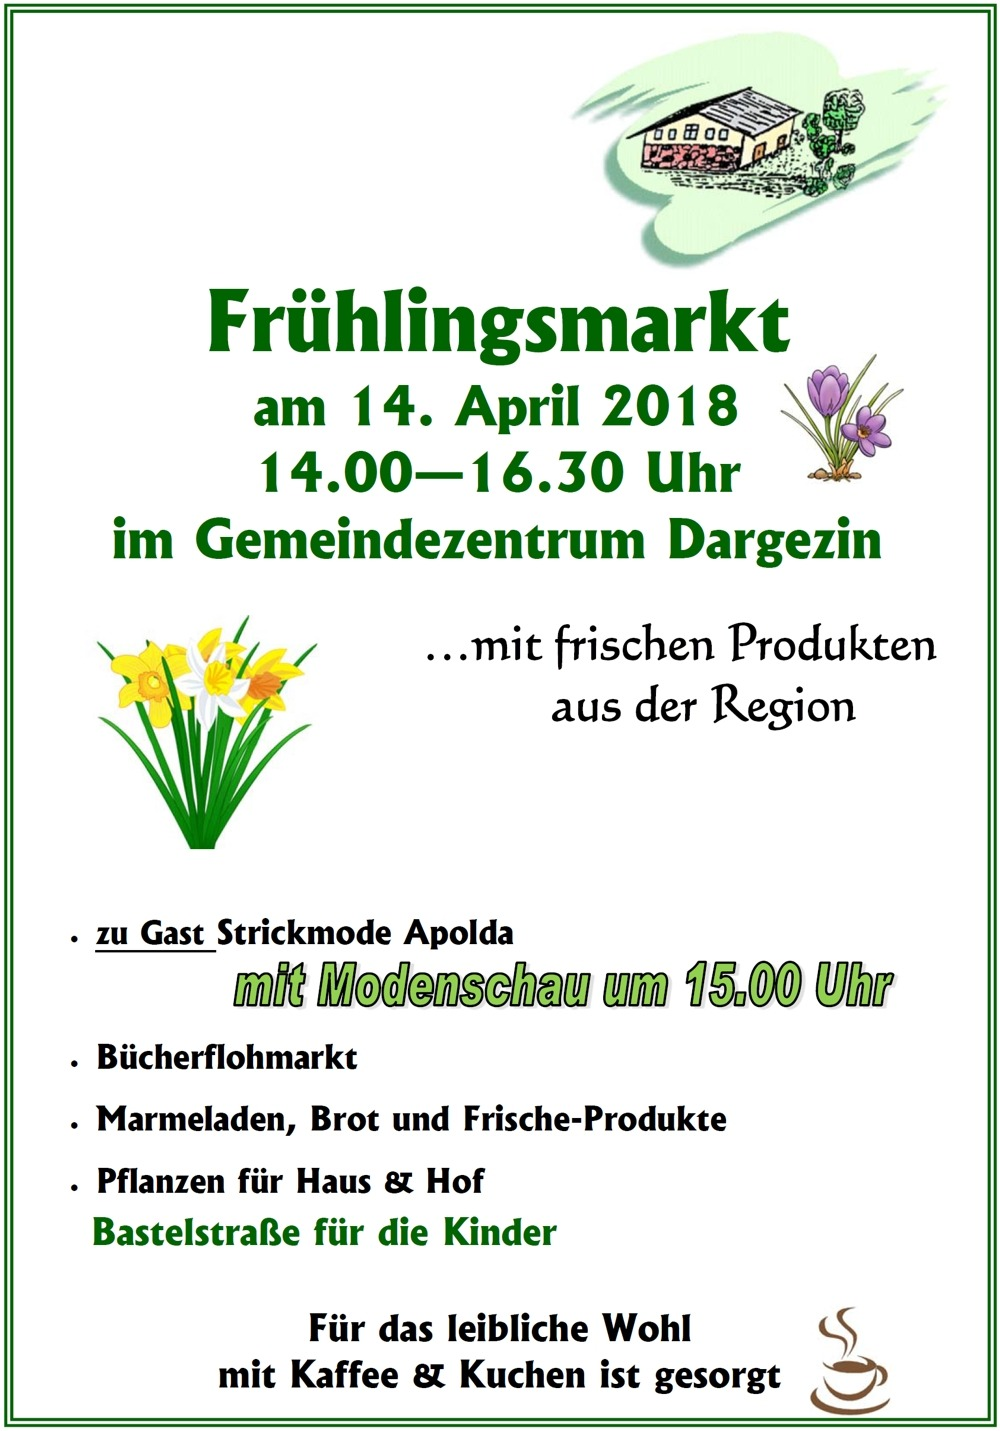 Fruehlingsmarkt_Dargezin_2018